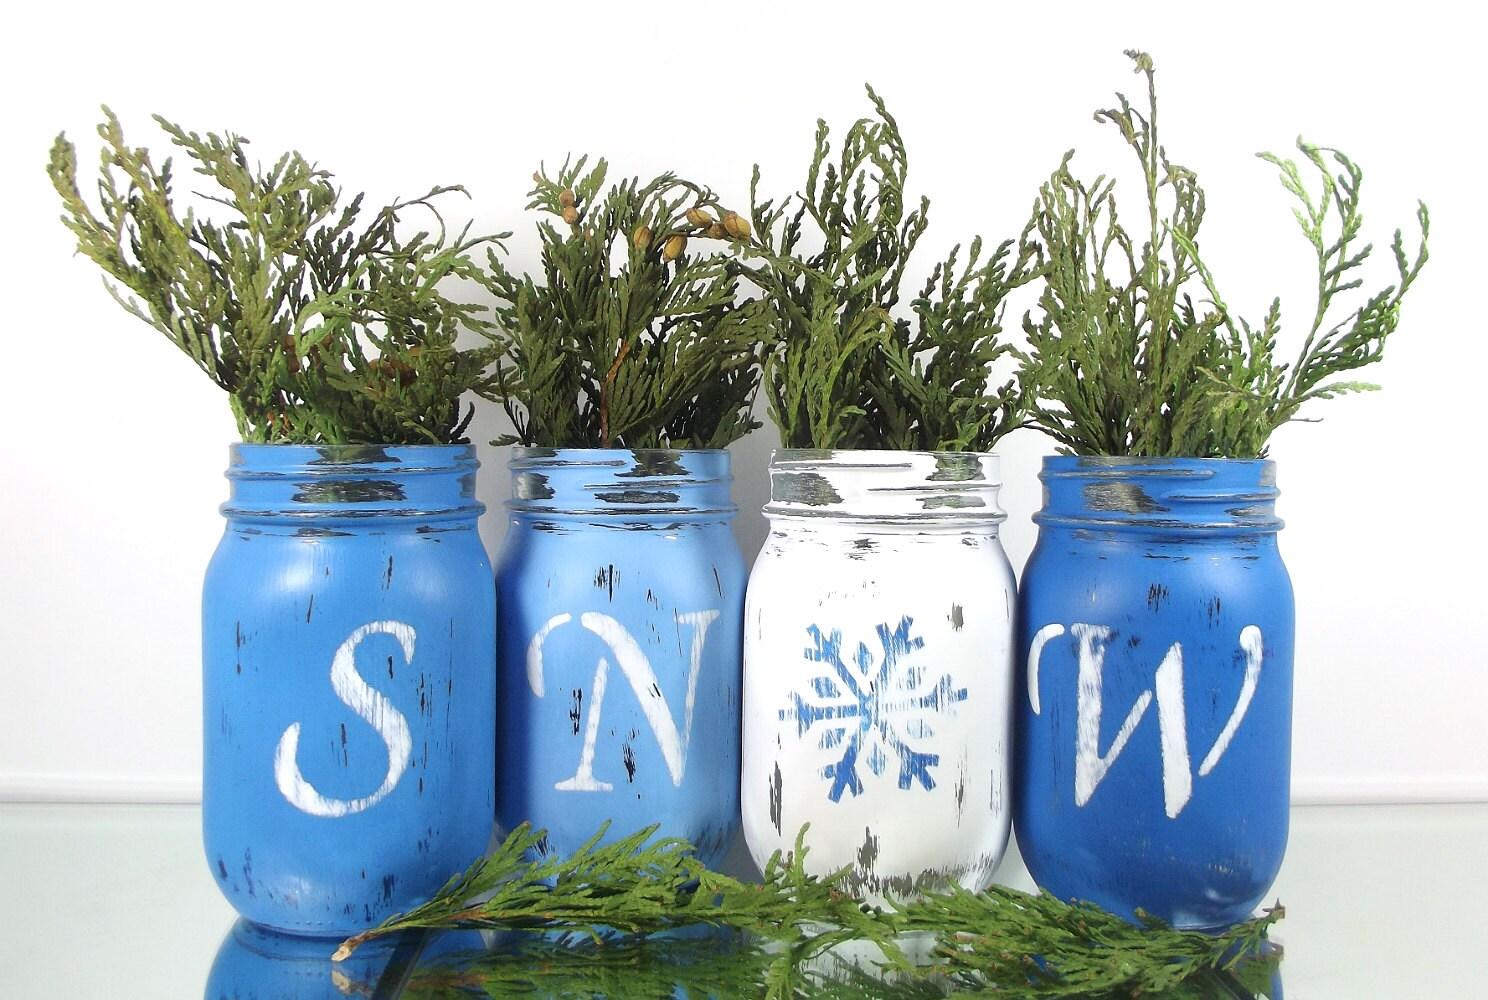 snow winter decor painted mason jar decor winter. Black Bedroom Furniture Sets. Home Design Ideas